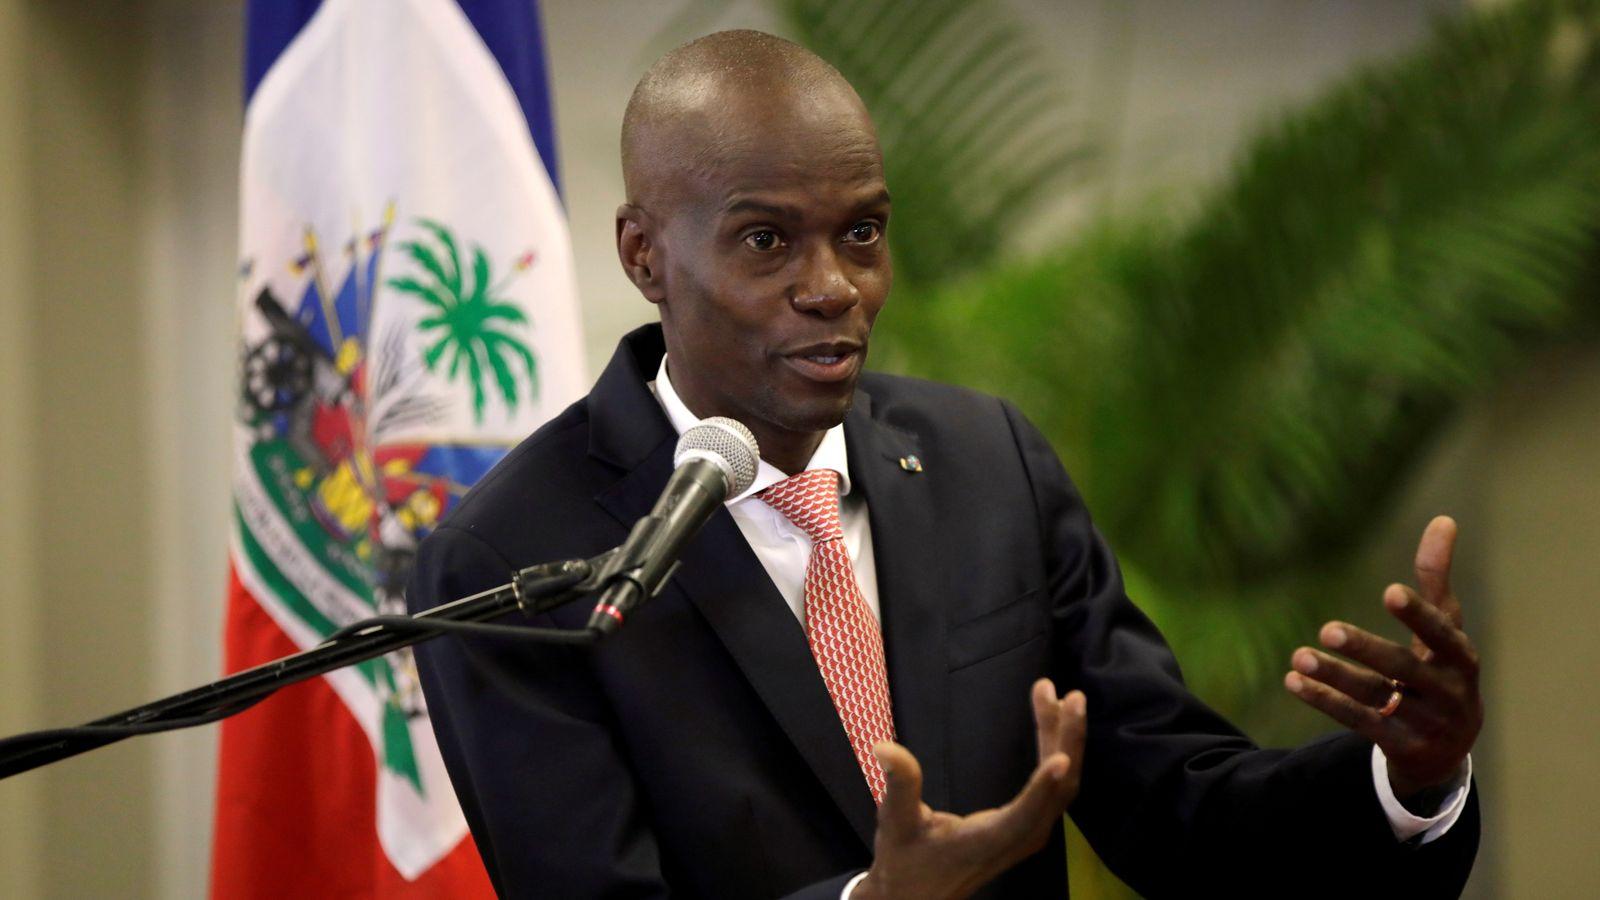 Haitian President Jovenel Moise assassination condemned by Joe Biden as 'heinous attack'